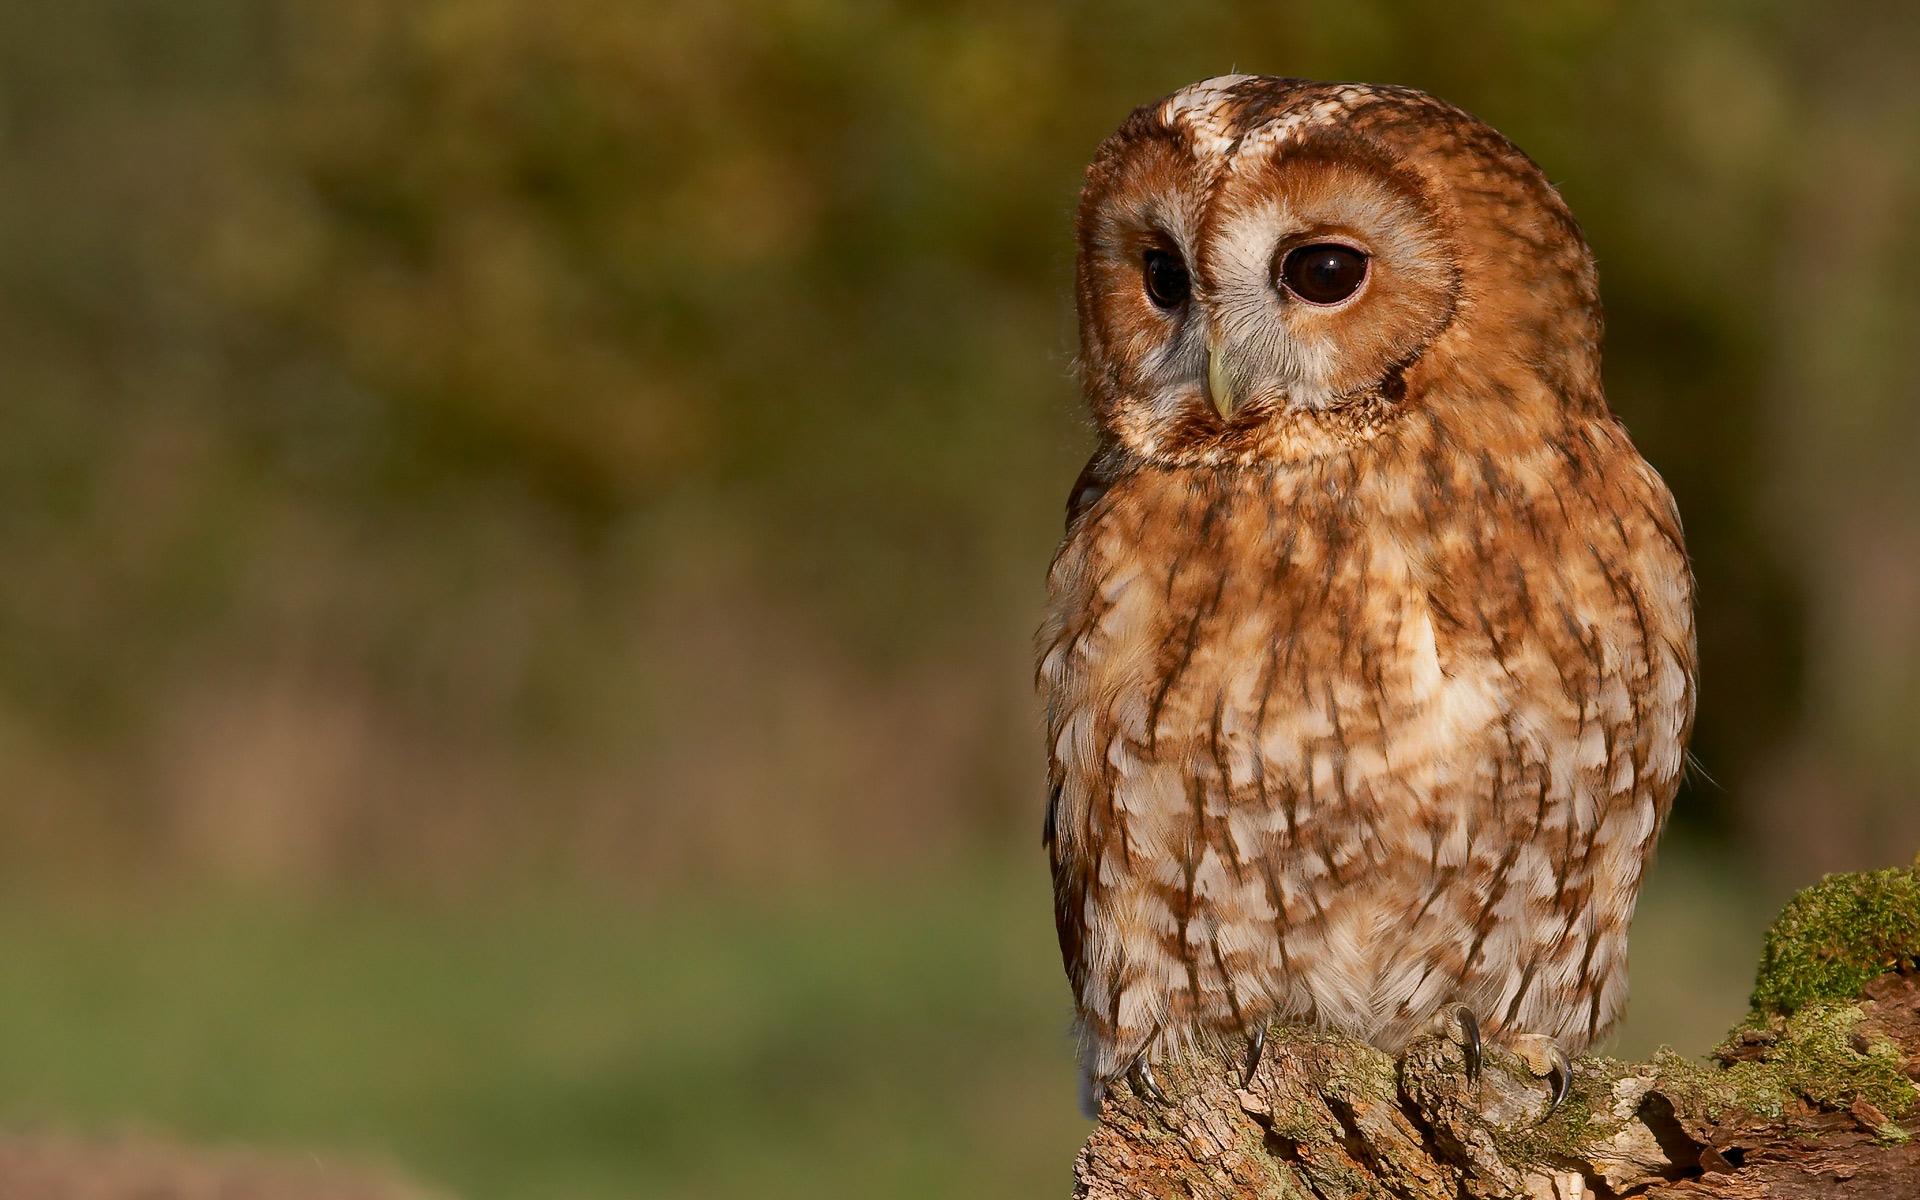 Tawny Owl Wallpaper by Photosbykev Tawny Owl Wallpaper by Photosbykev